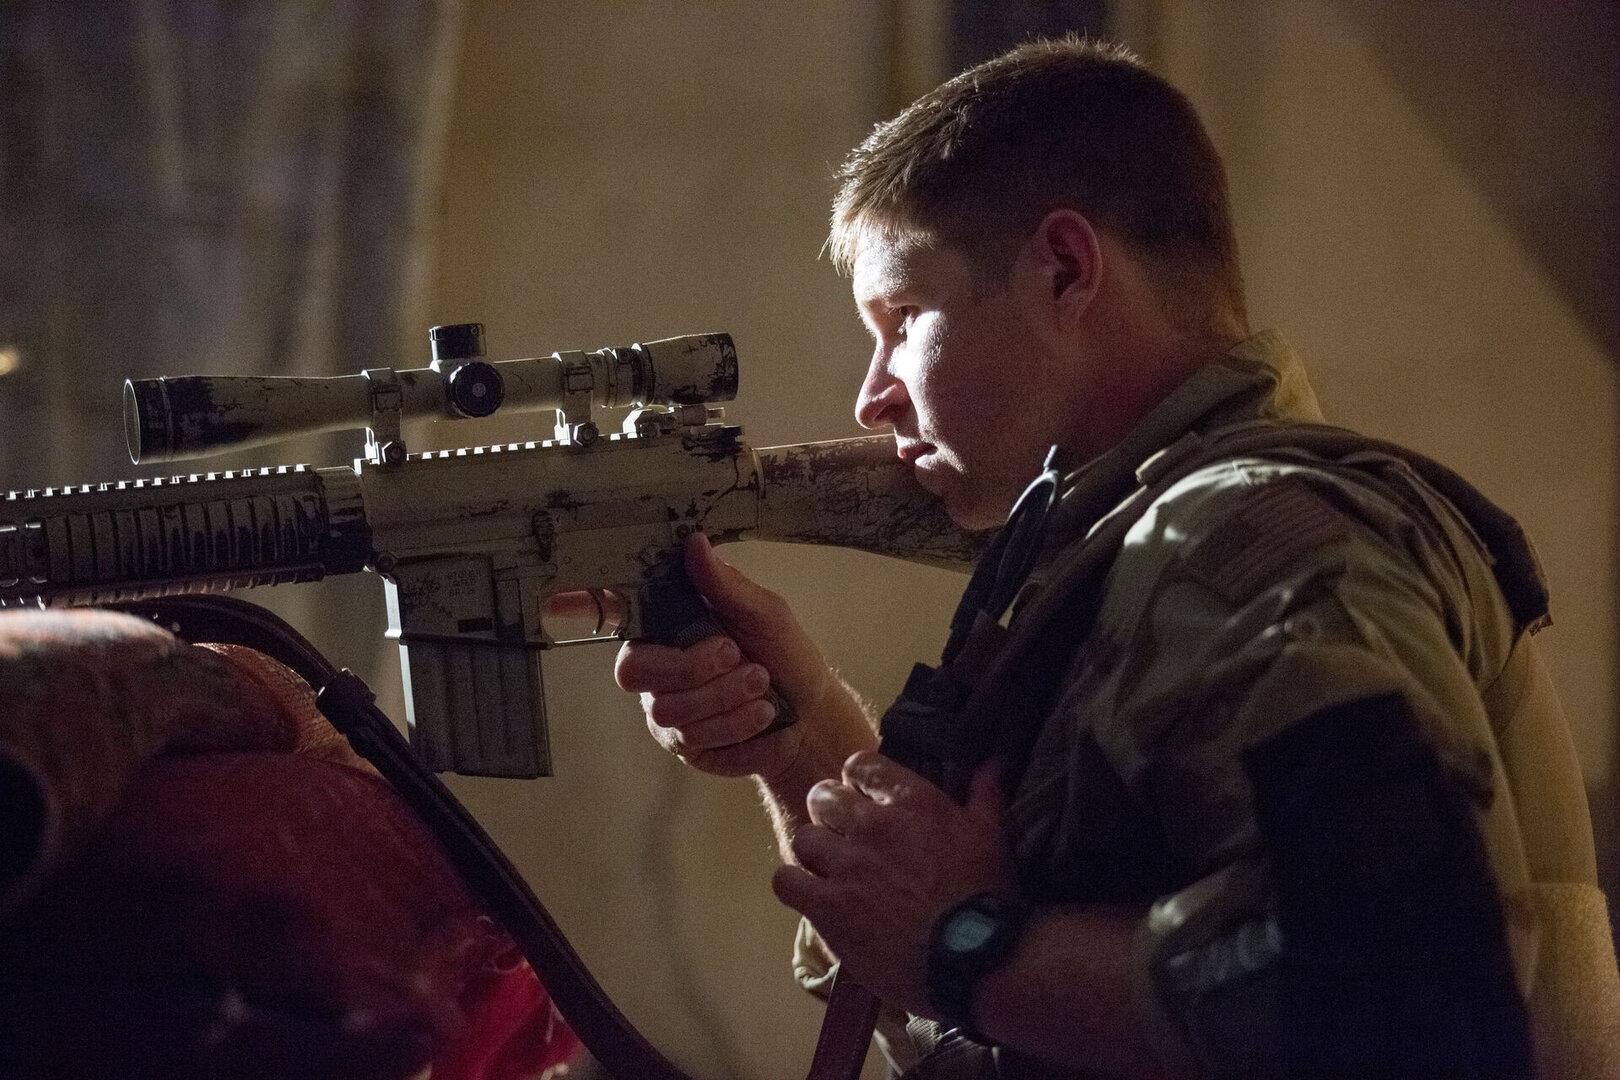 Barak 2000 HTR H-S Precision Pro Series 2000 HTR sniper